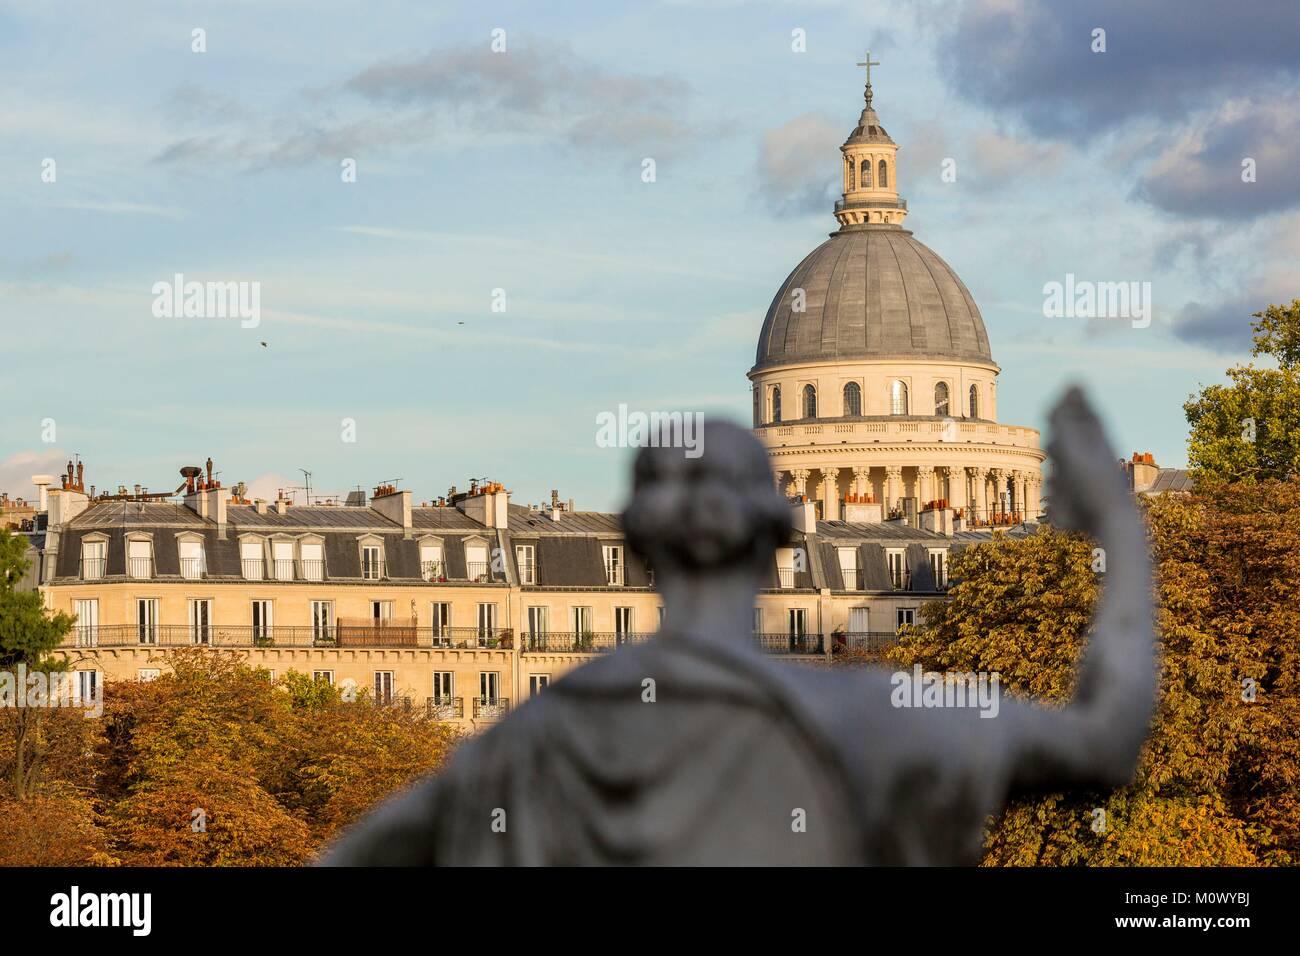 France,Paris,Luxembourg Garden - Stock Image